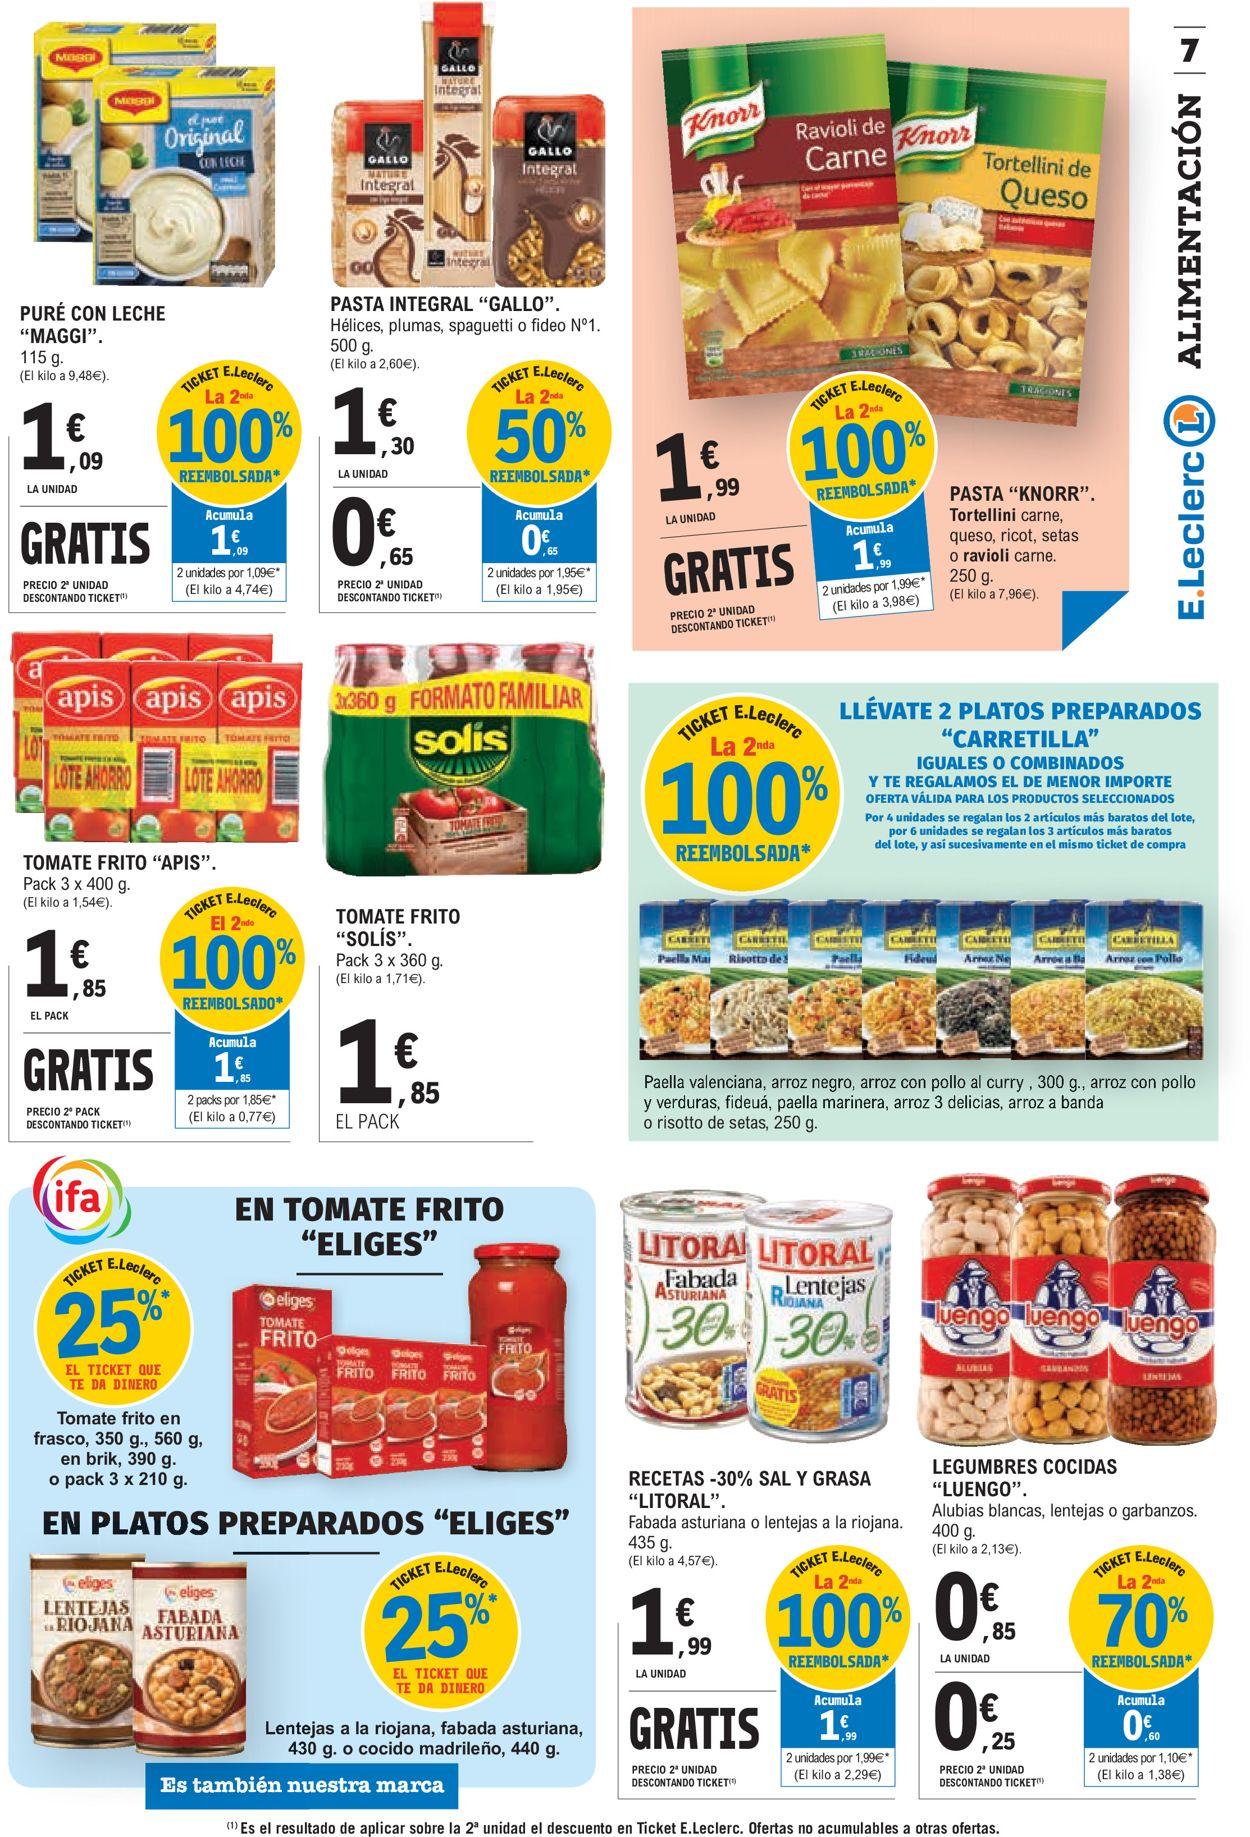 E.leclerc Folleto - 24.06-05.07.2020 (Página 7)